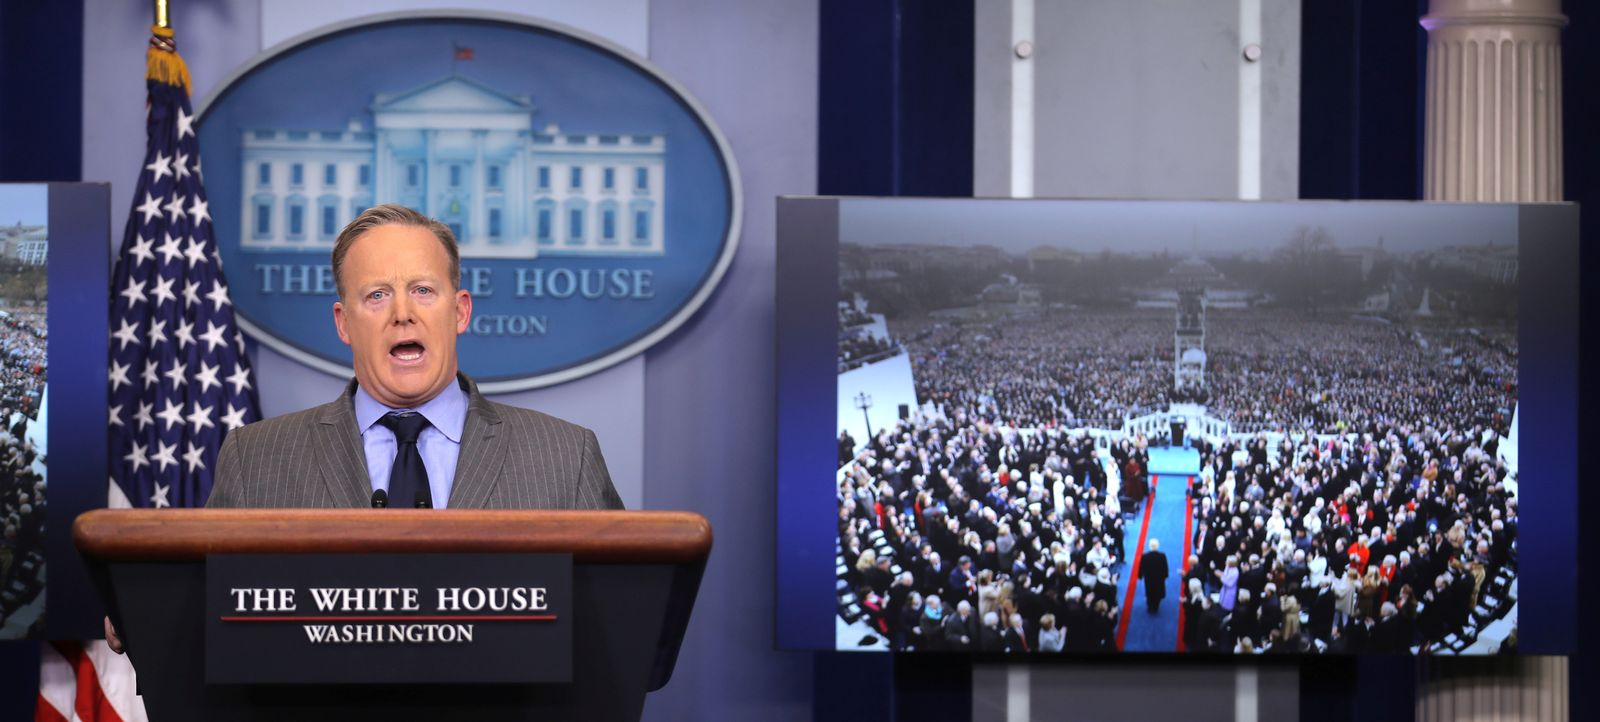 Press Secretary Sean Spicer / Iauguration